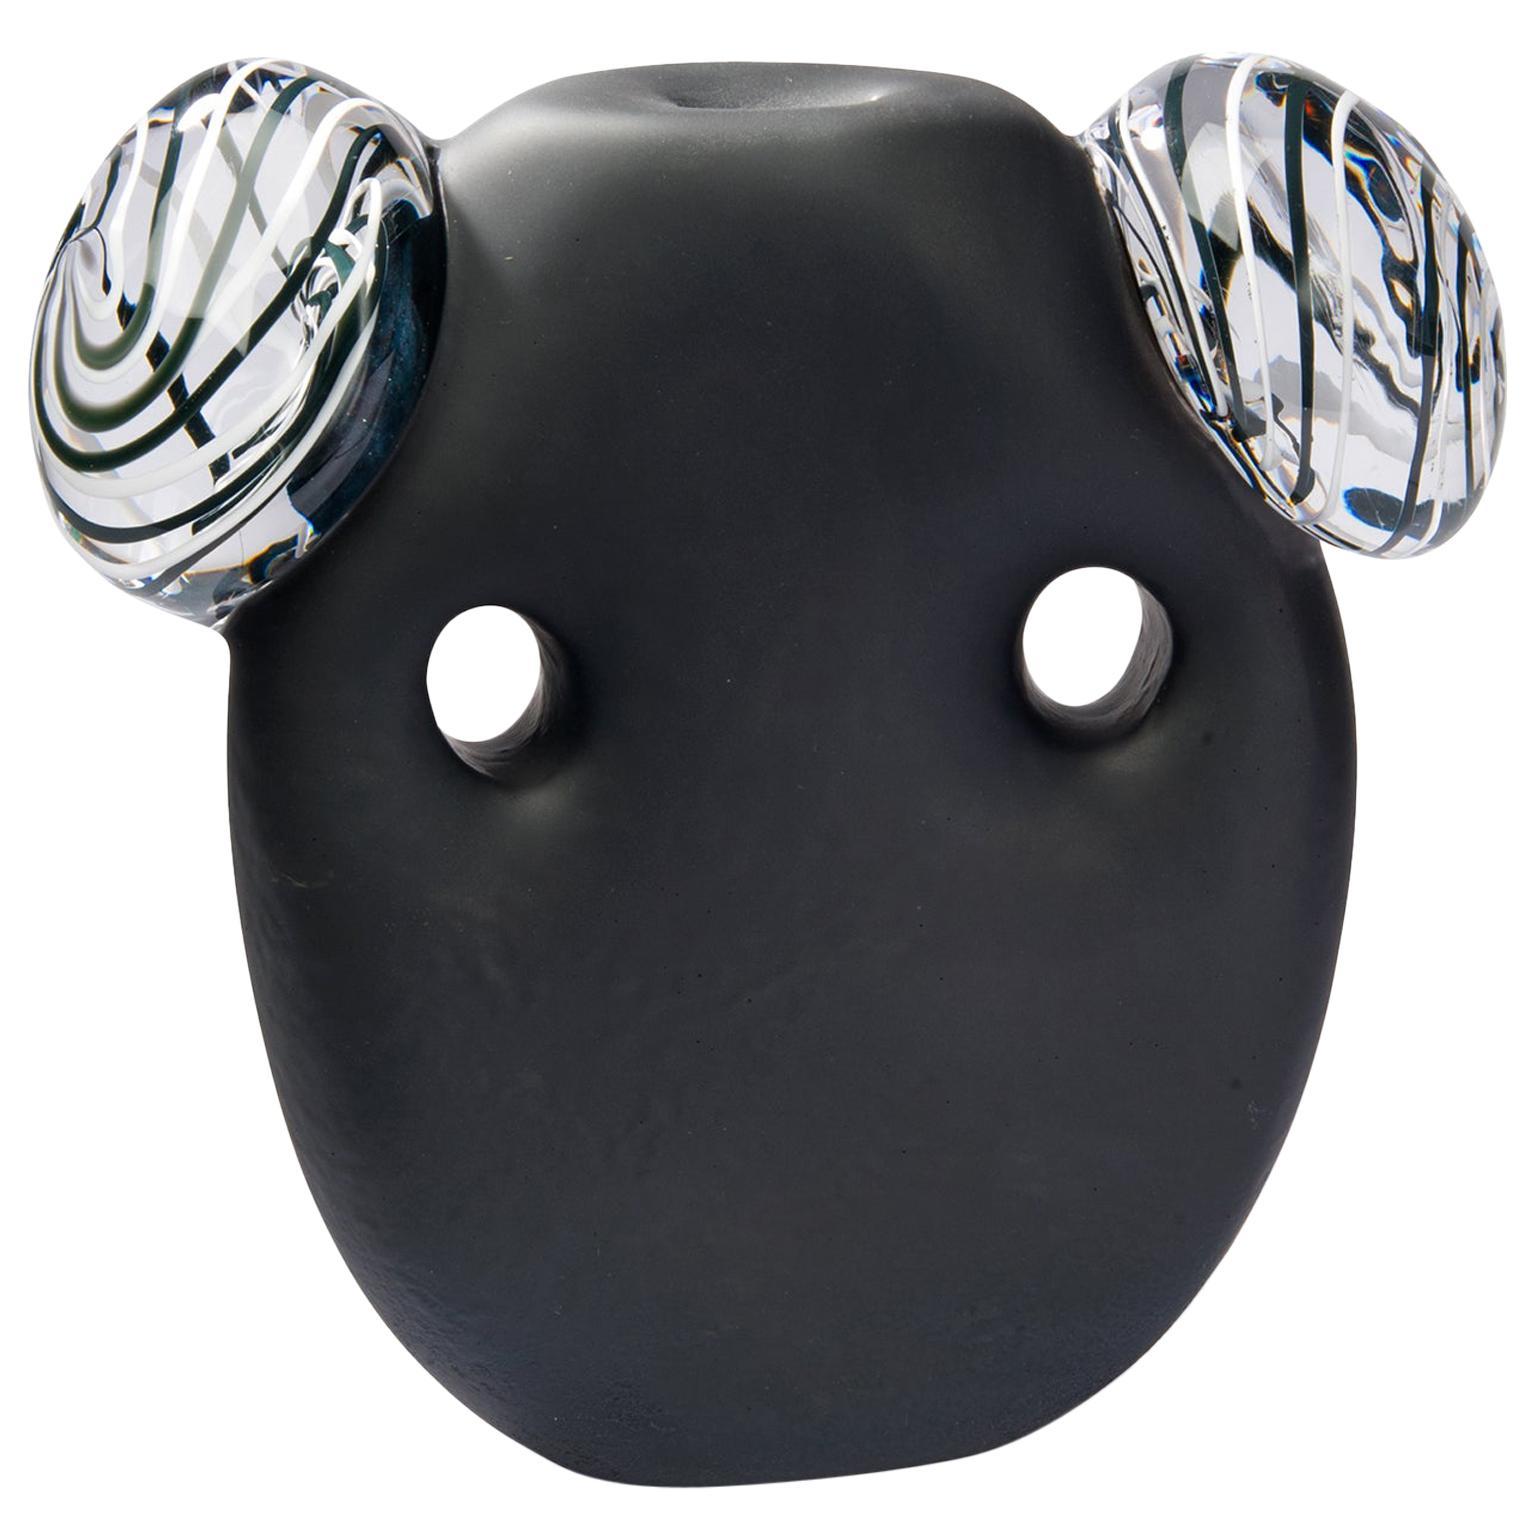 Glass object. Crystal Black Mask White Ears.